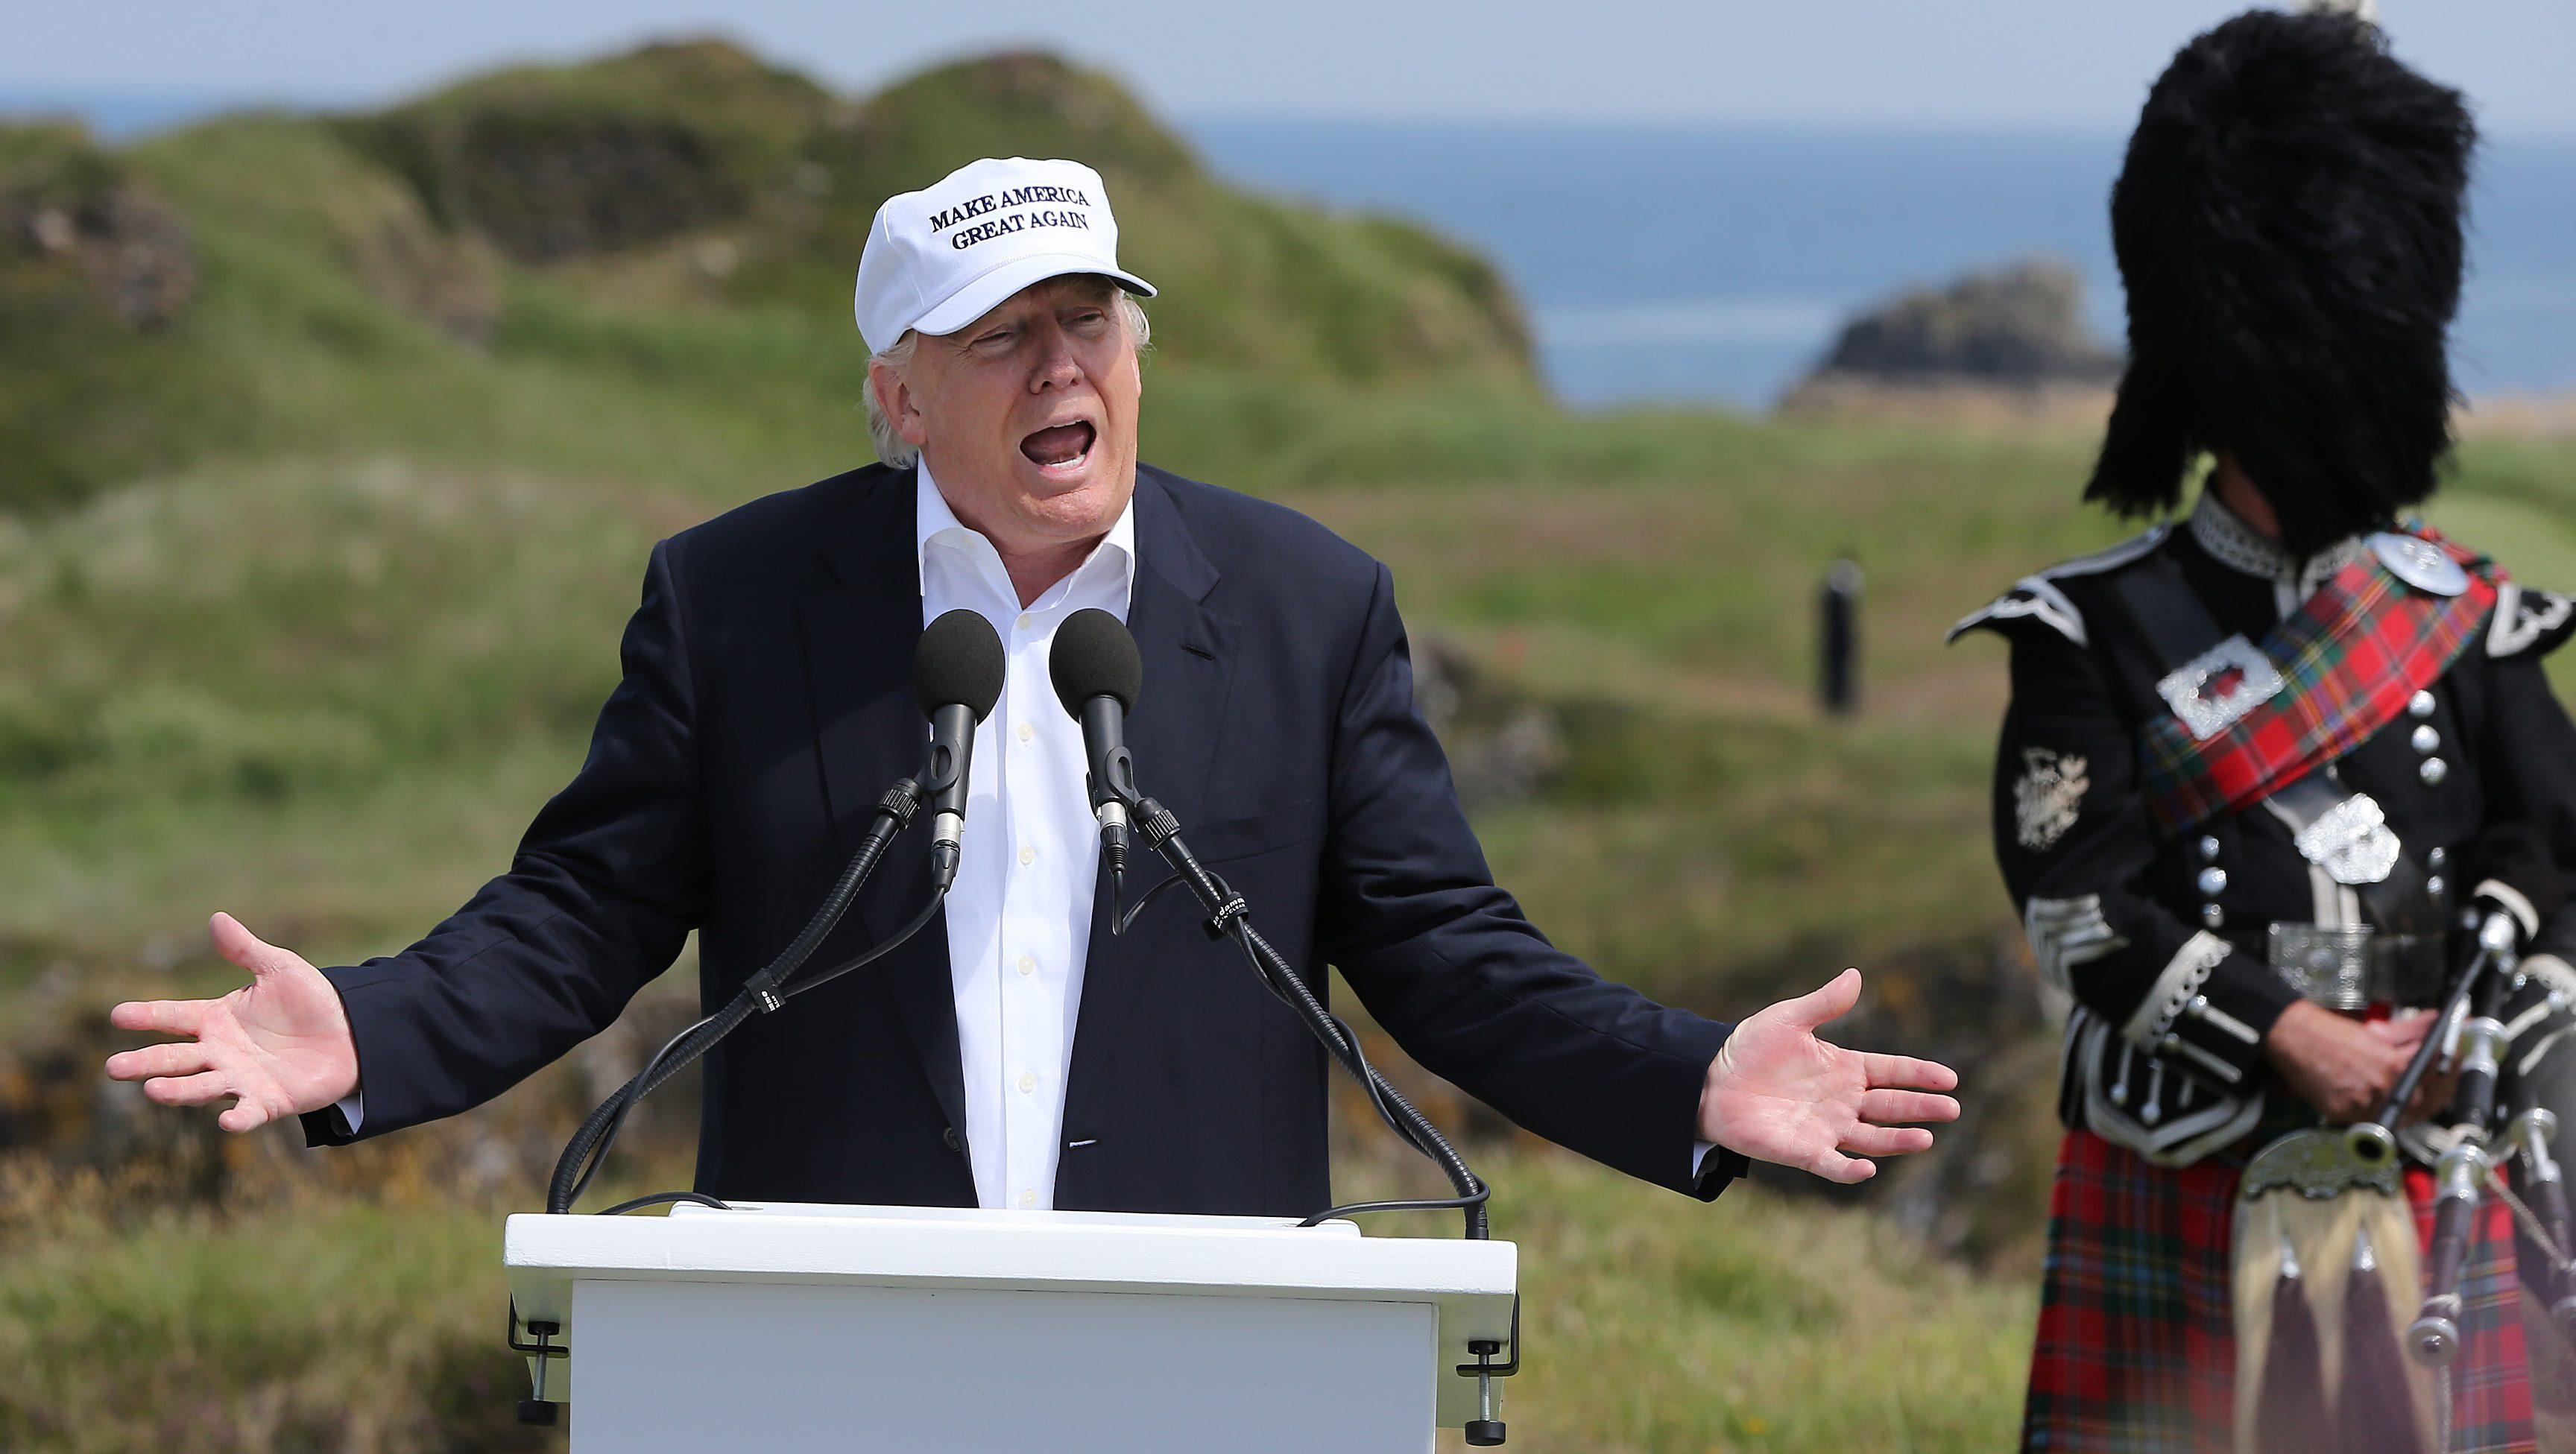 04c1288106 Donald Trump's visit to Scotland inspired some very creative British  profanity